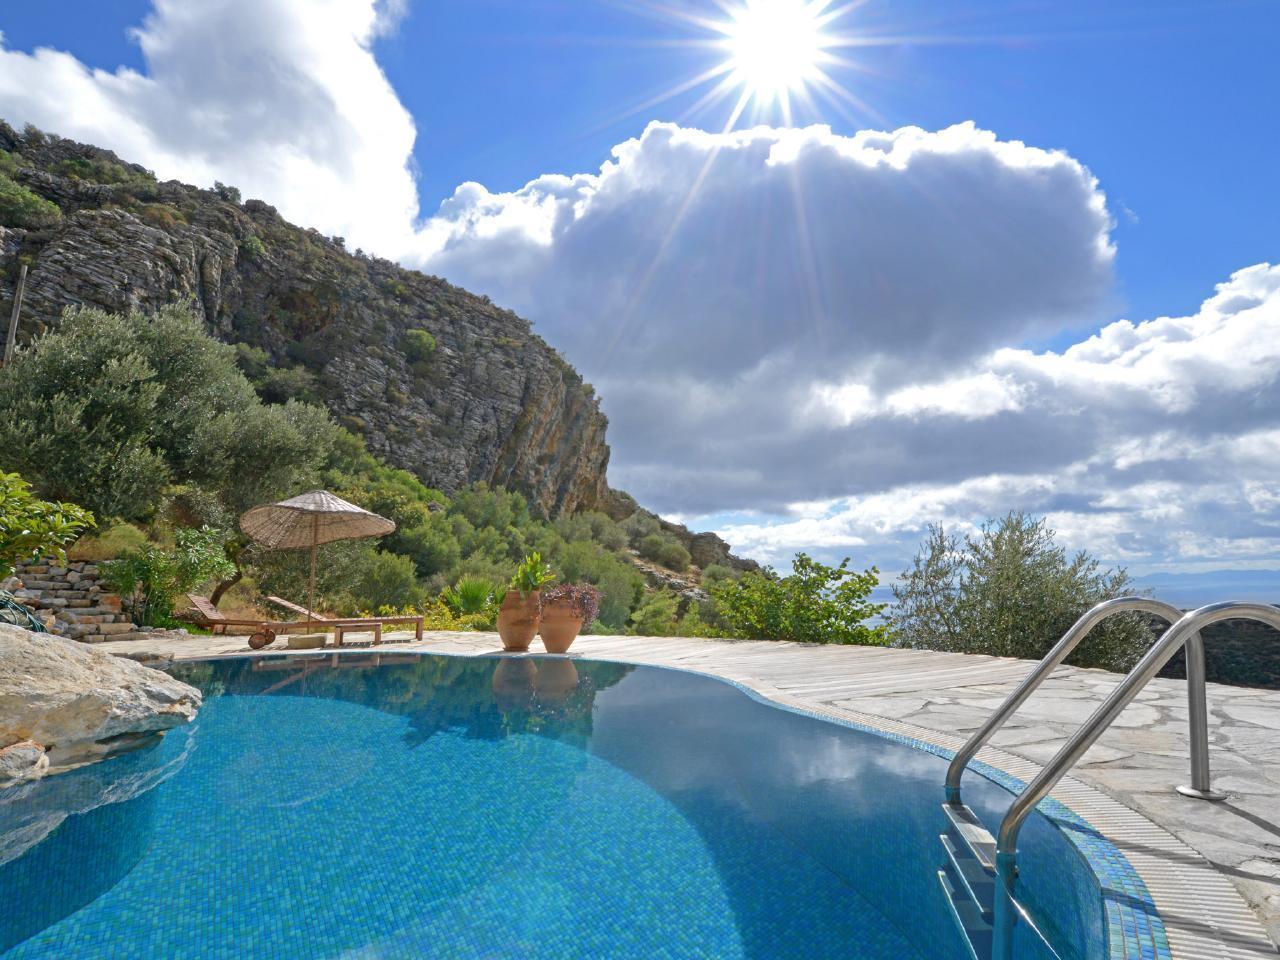 Maison de vacances Exklusives Chalet, romantisch am Berghang und Meer gelegen (2506674), Mesudiye, , Région Egéenne, Turquie, image 3